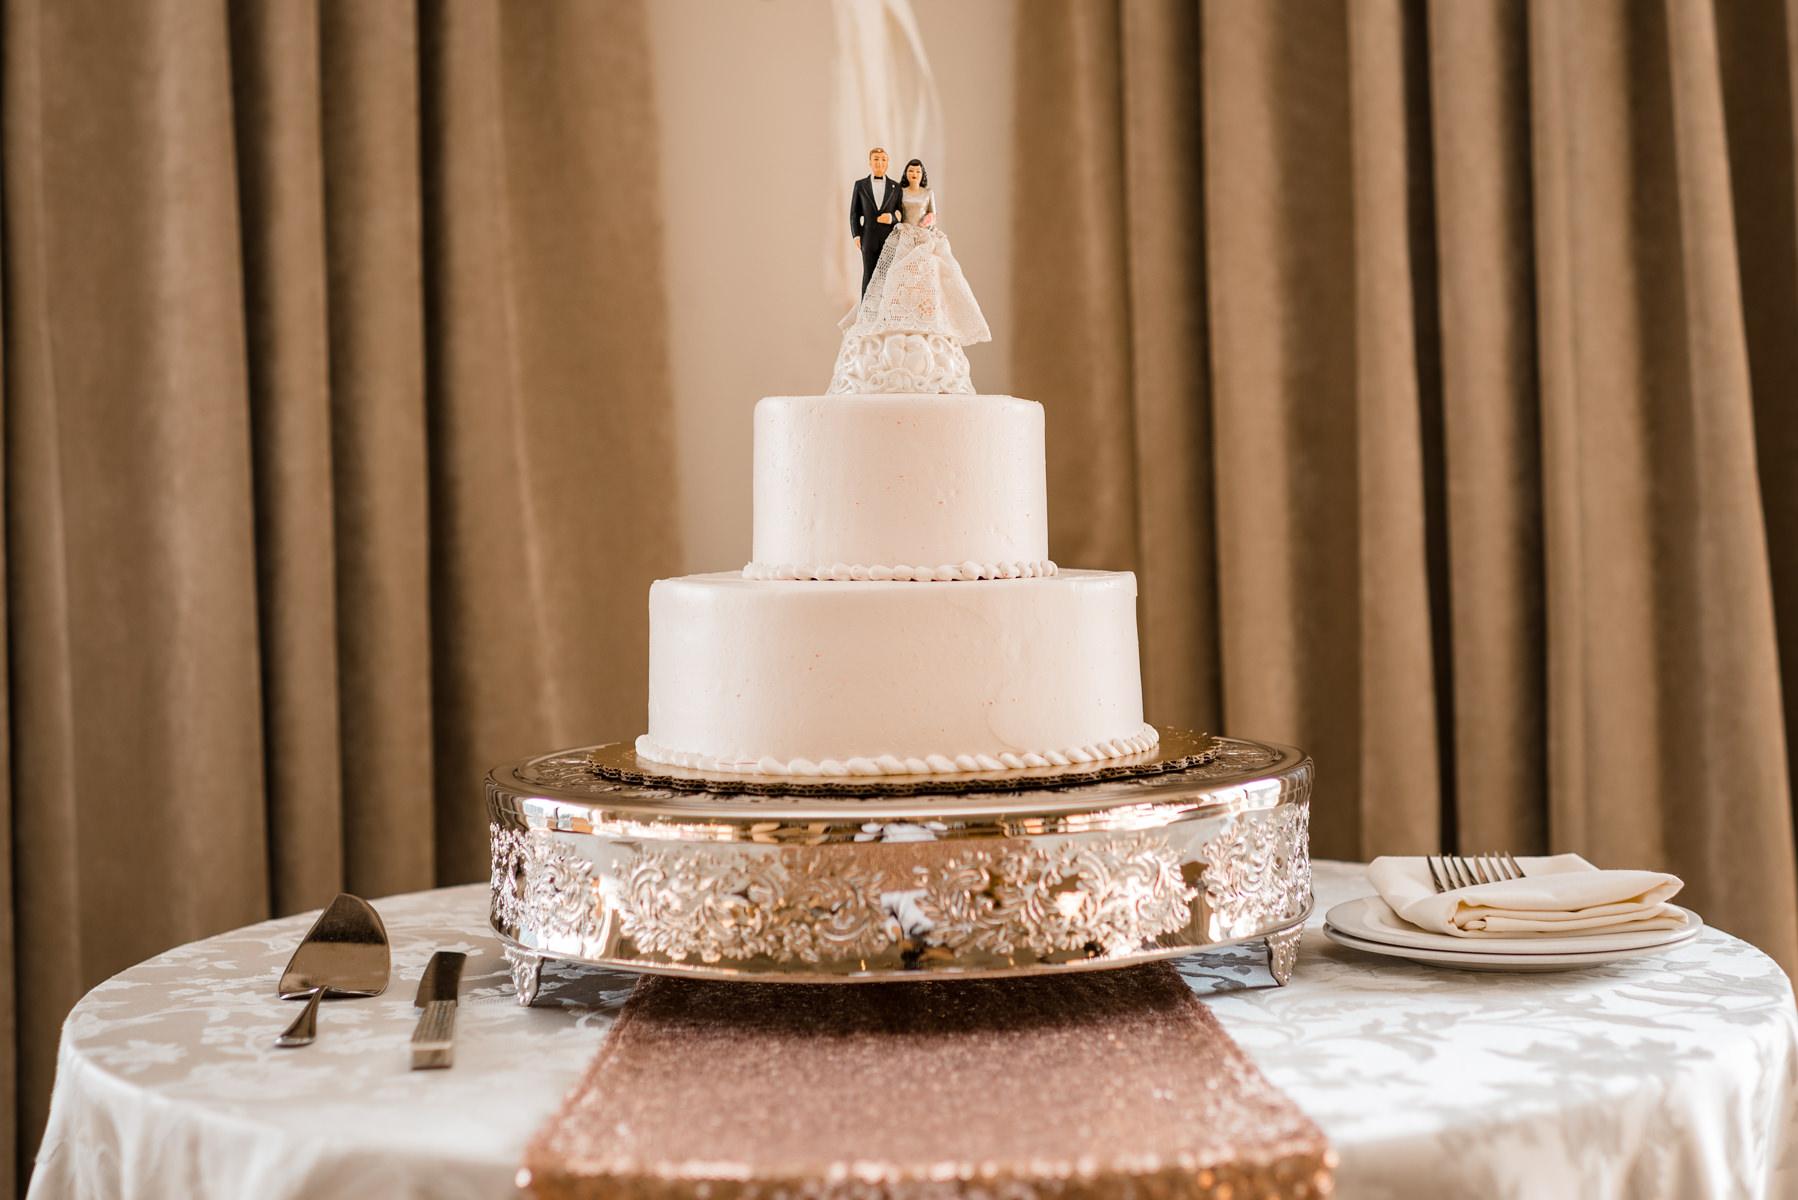 Andrew Tat - Documentary Wedding Photography - Hotel Sorrento - Seattle, Washington -Jessica & Paul - 28.jpg